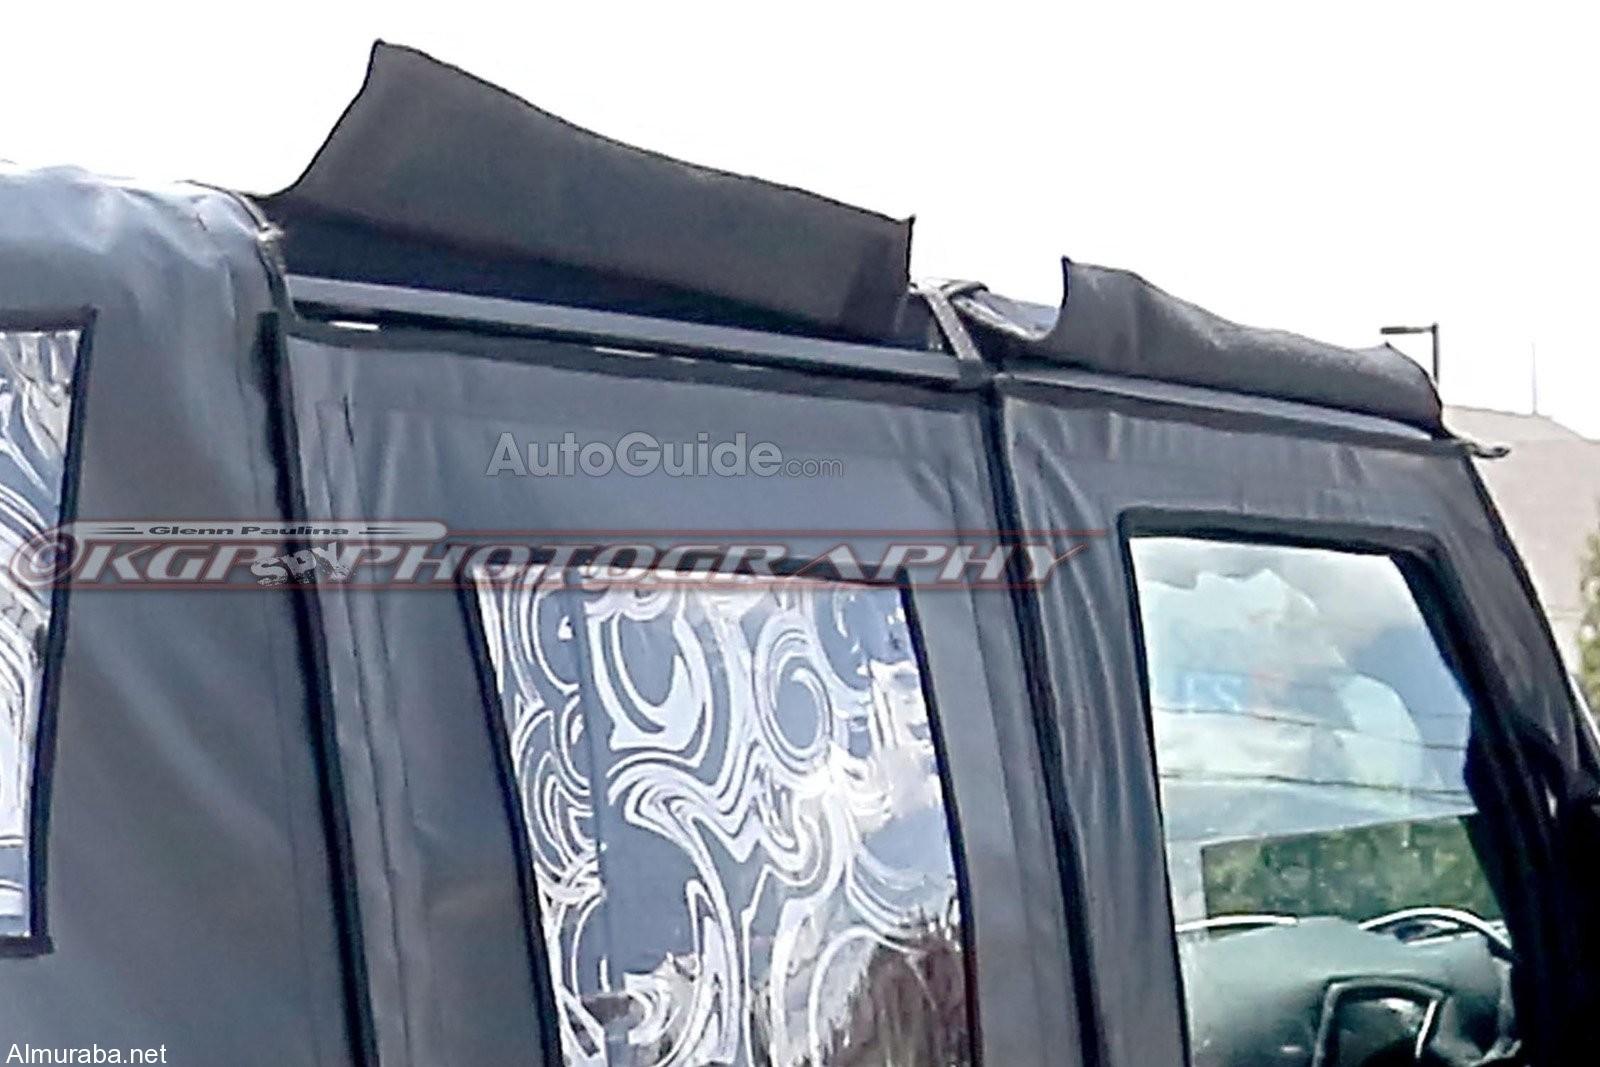 2018-Jeep-Wrangler-Spy-Shots-3